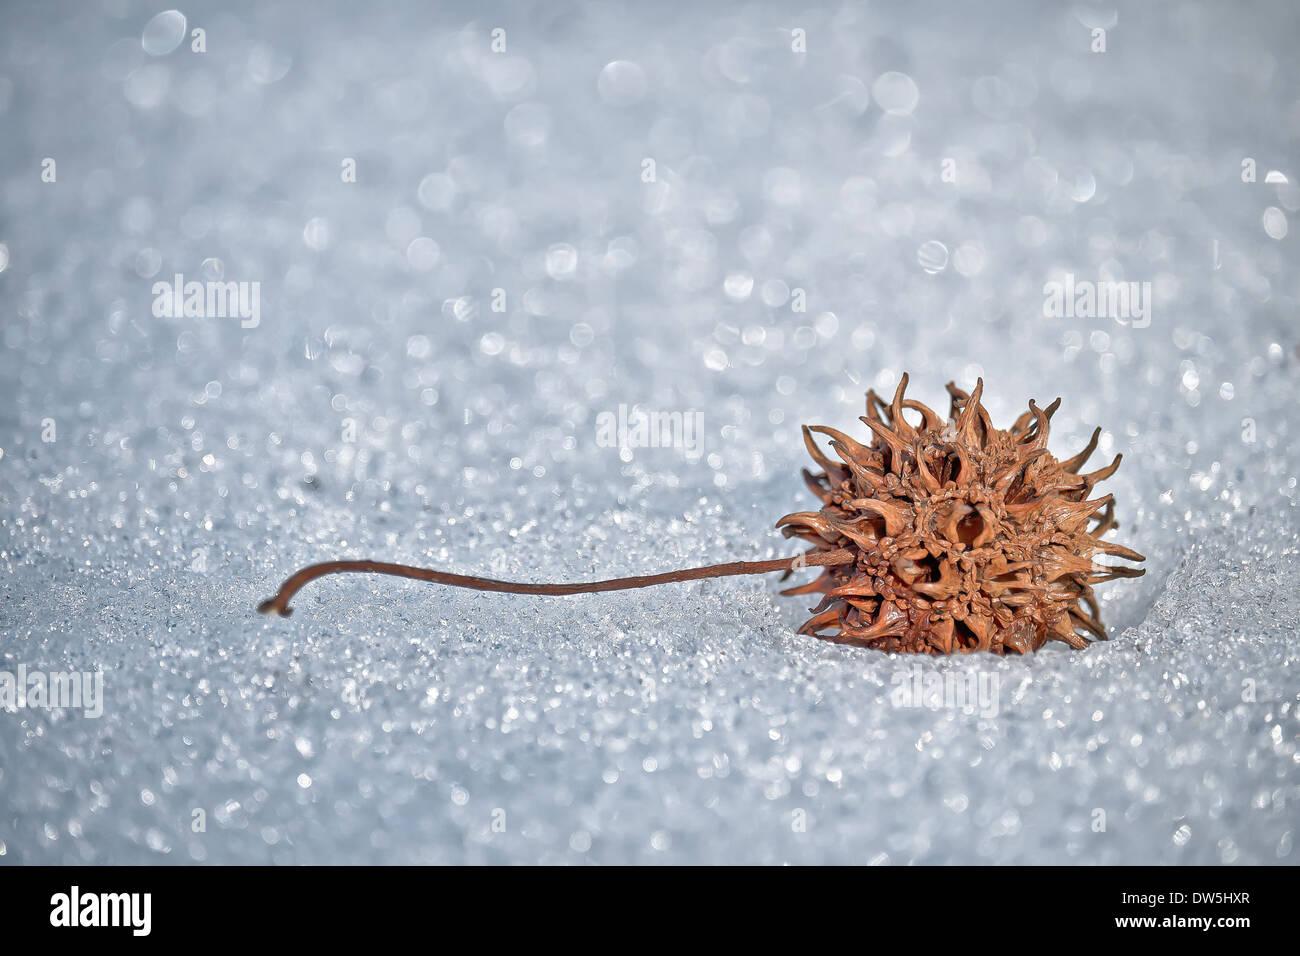 Sweet Gum Seed pod on snow - Stock Image